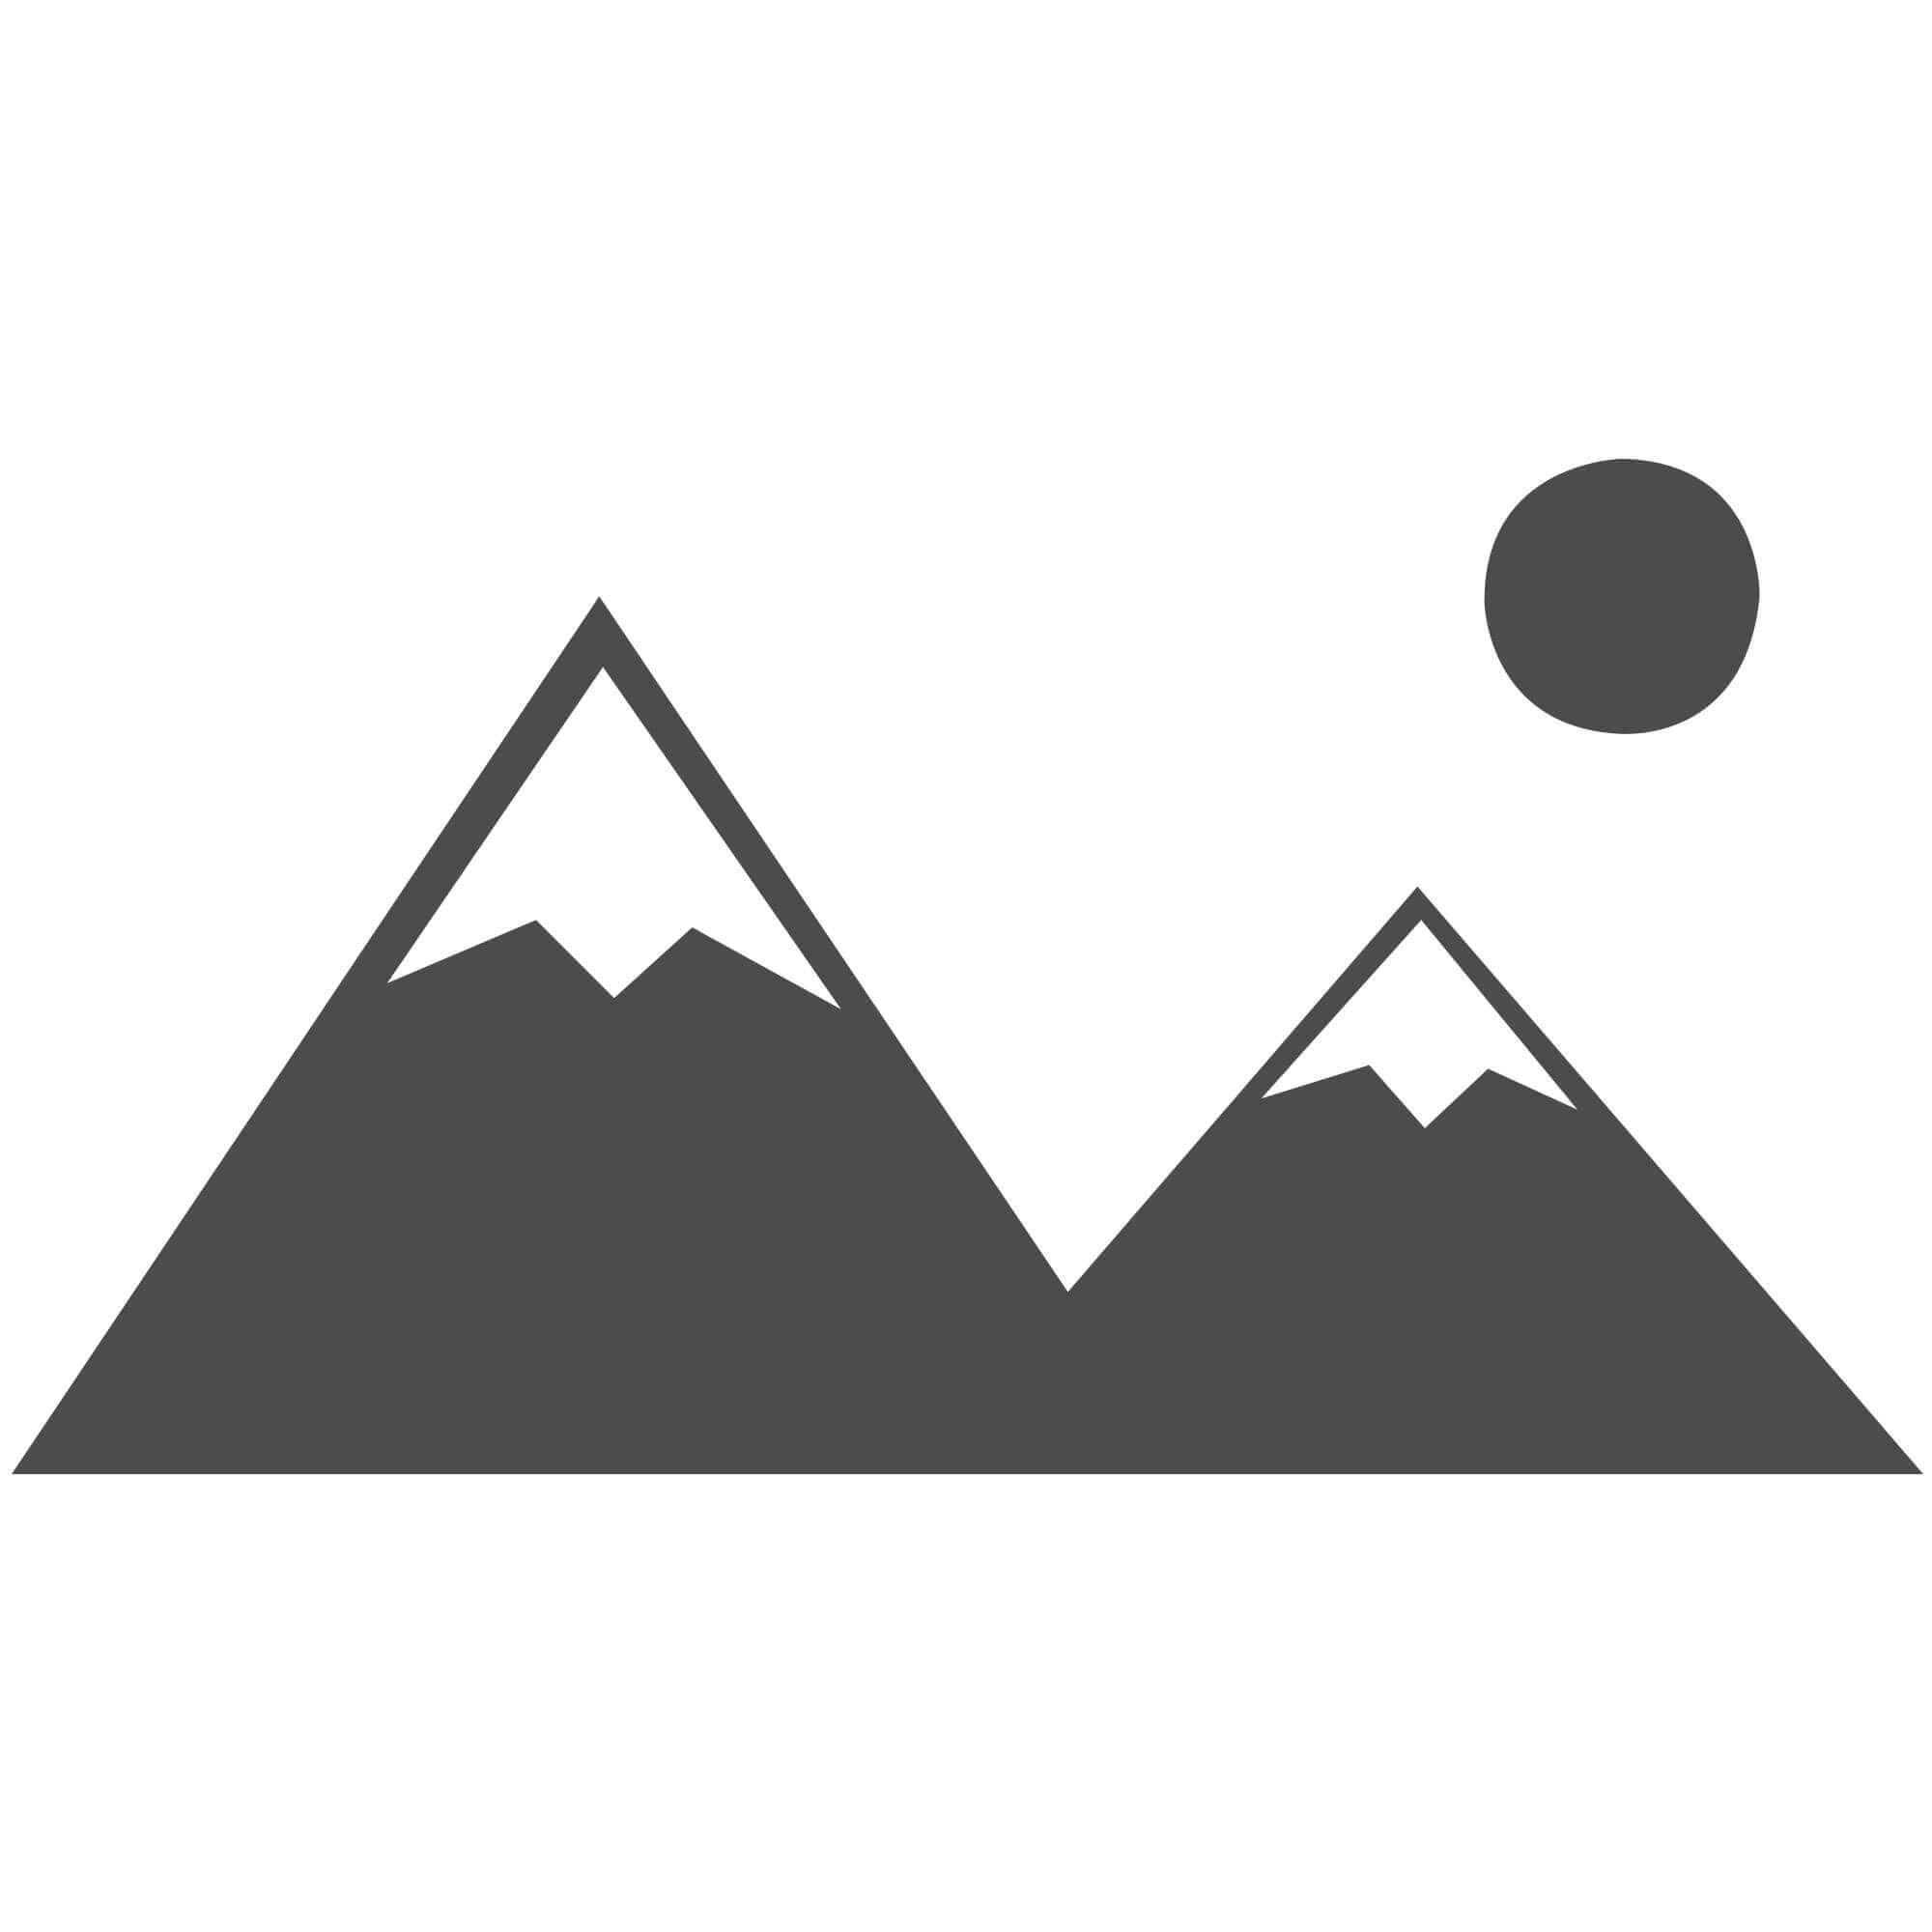 "Arabesque Moroccan Pattern Wool Rug - Grey-120 x 170 cm (4' x 5'7"")"